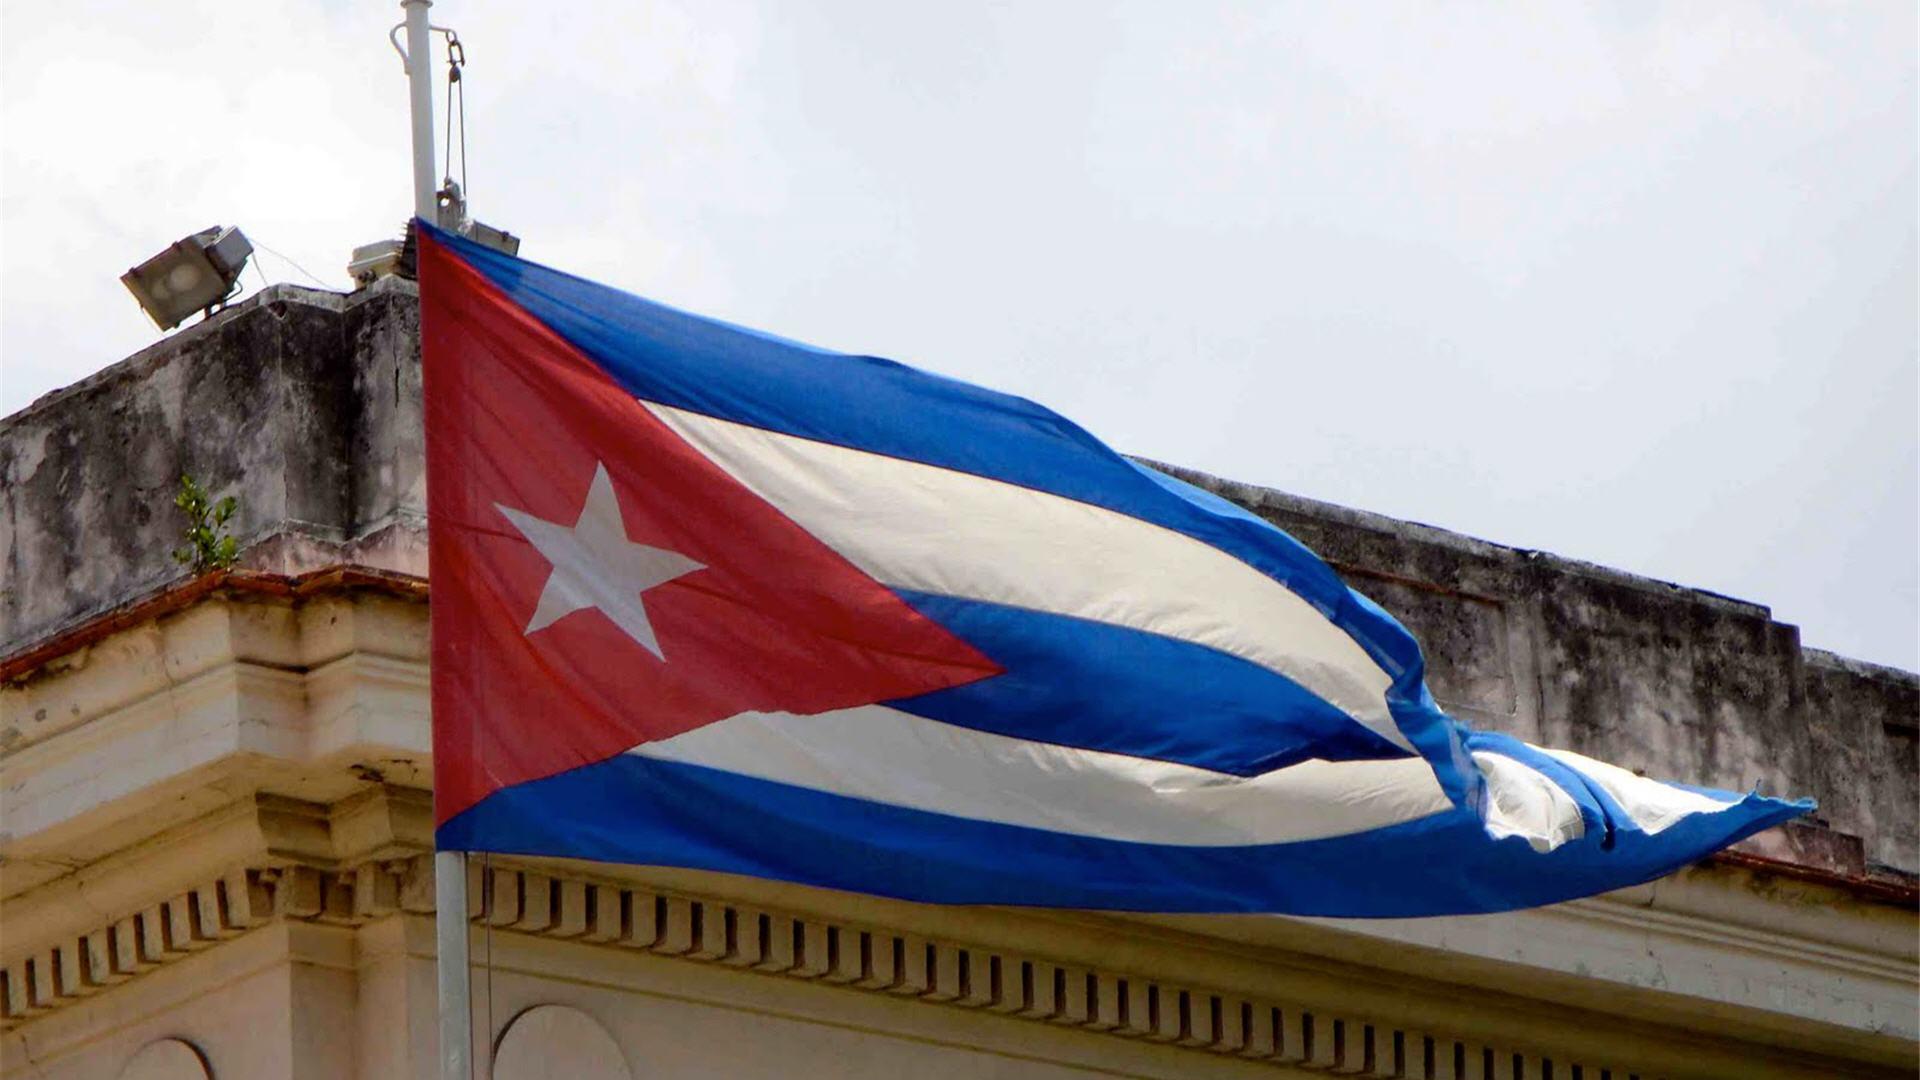 Cuban Flag Wallpaper HD 1920x1080 6336 1920x1080